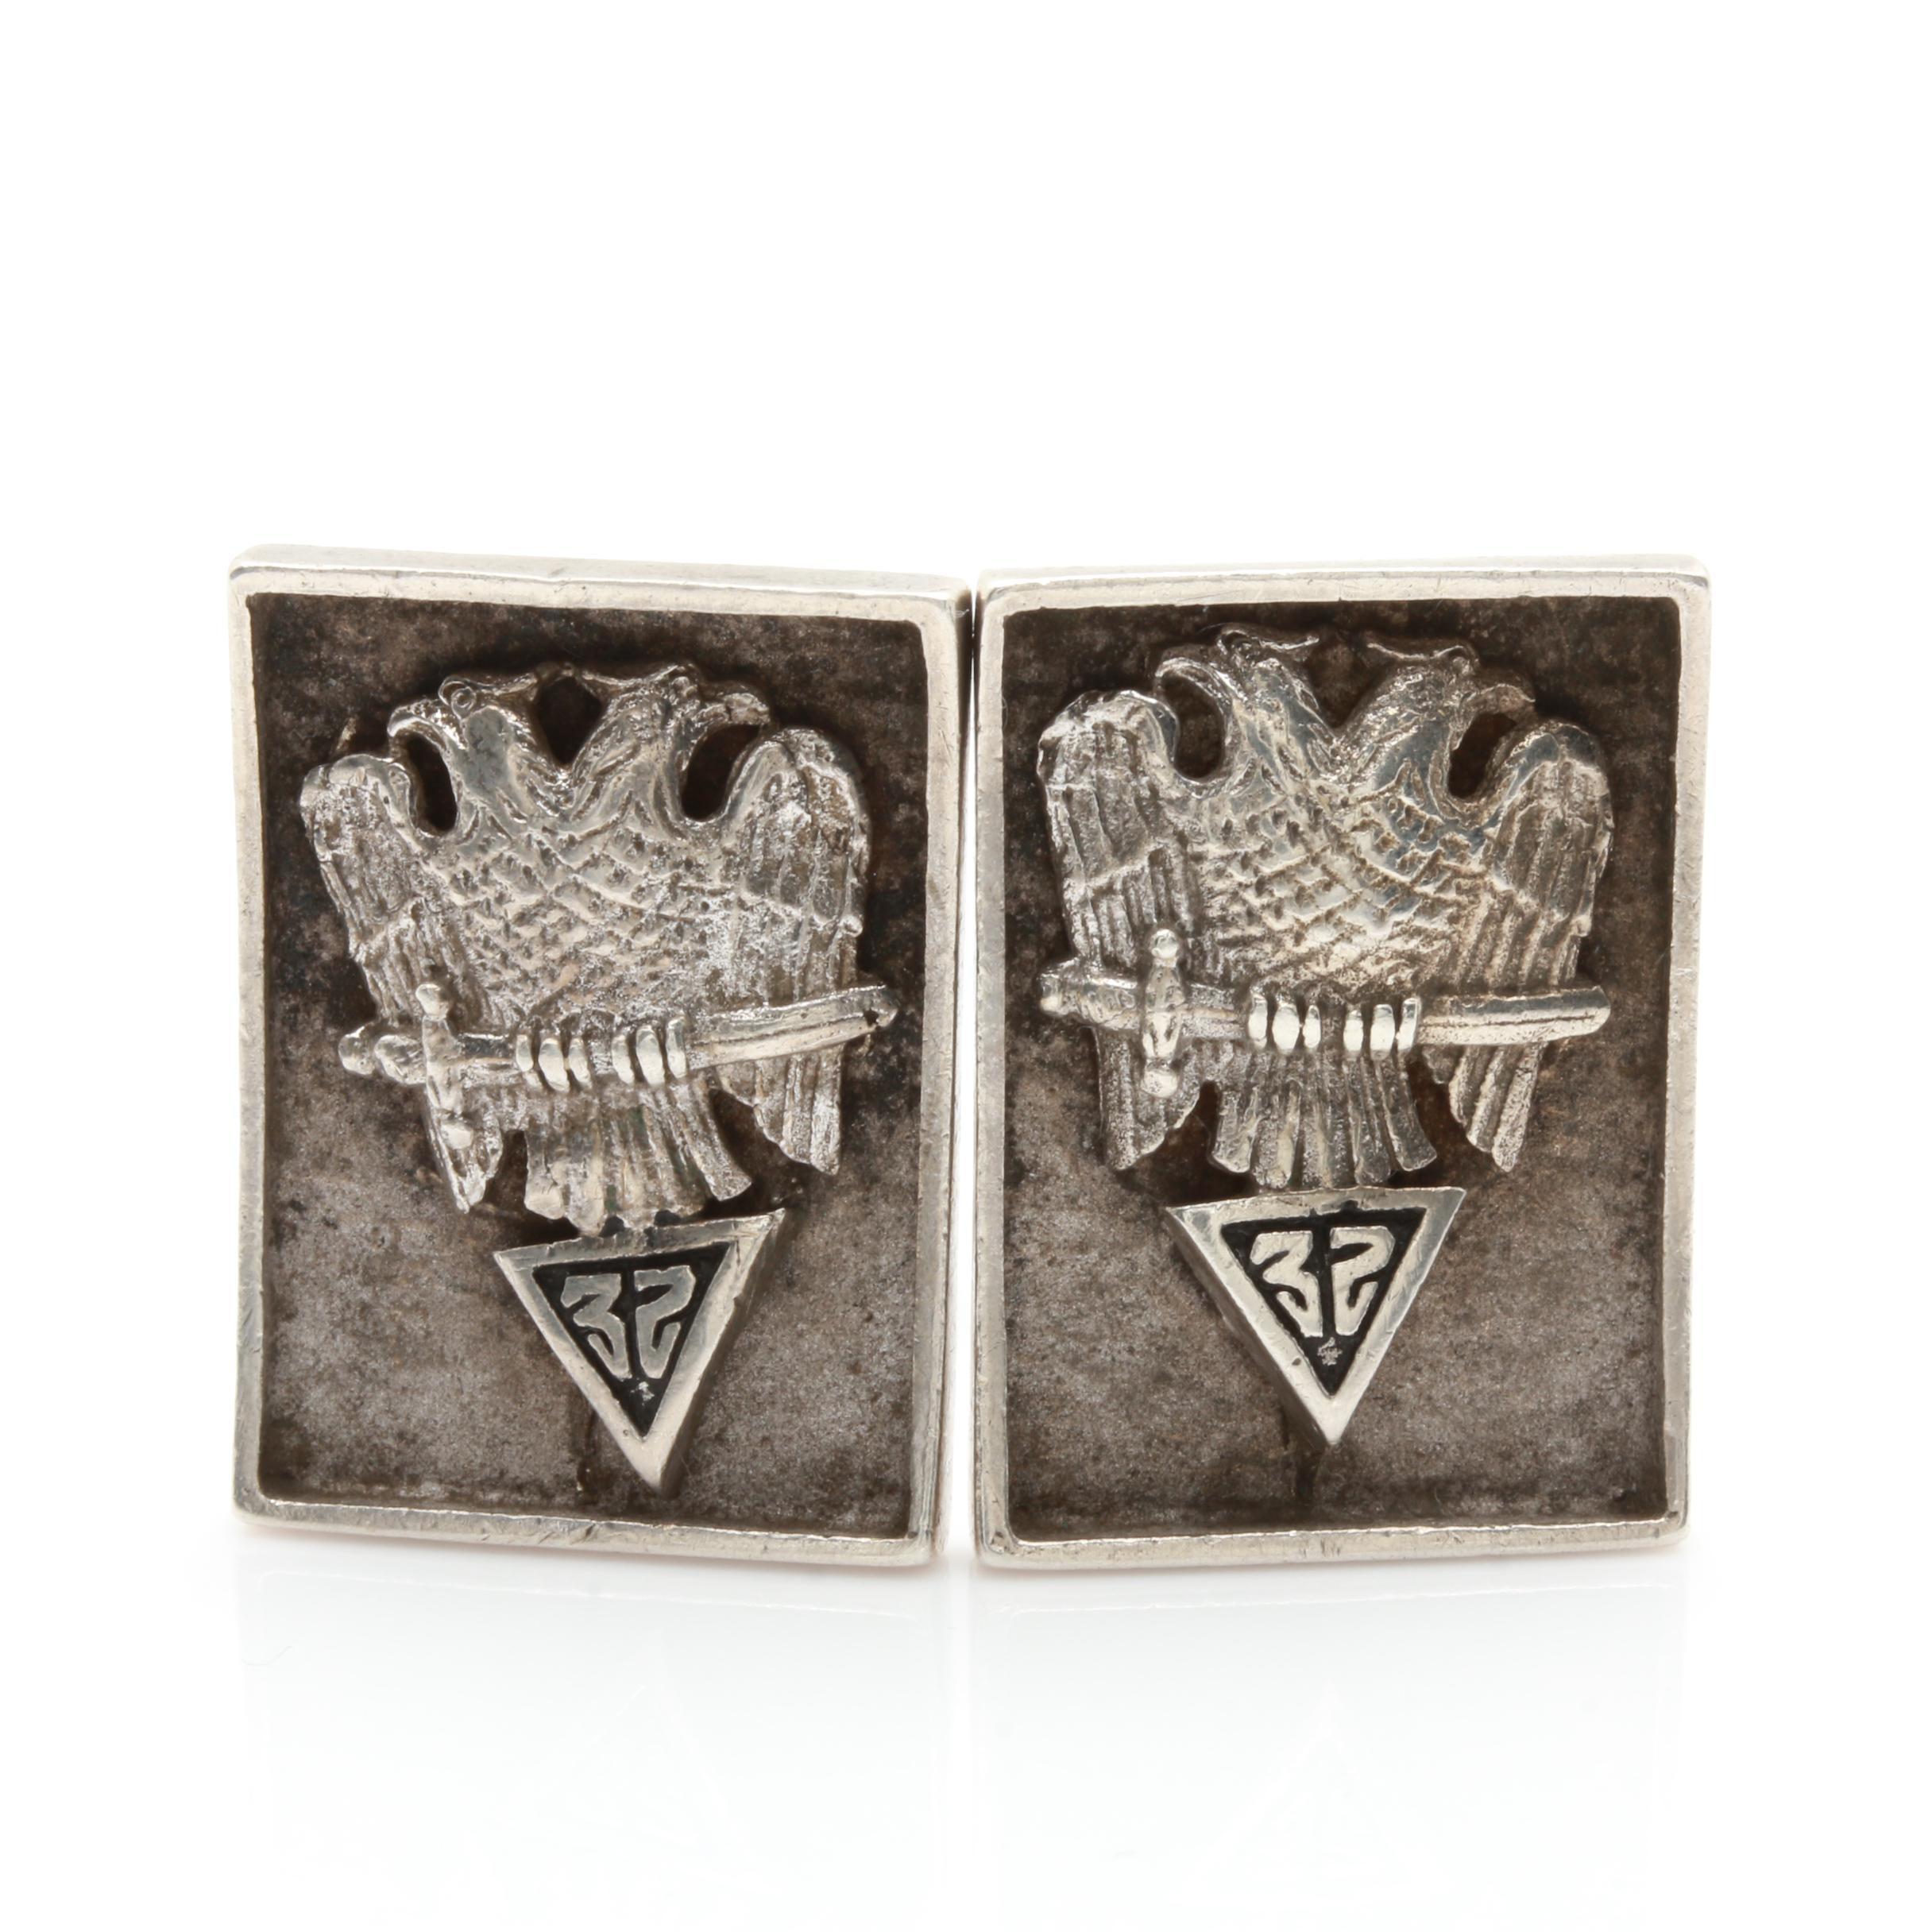 Vintage Sterling Silver Masonic Cufflinks